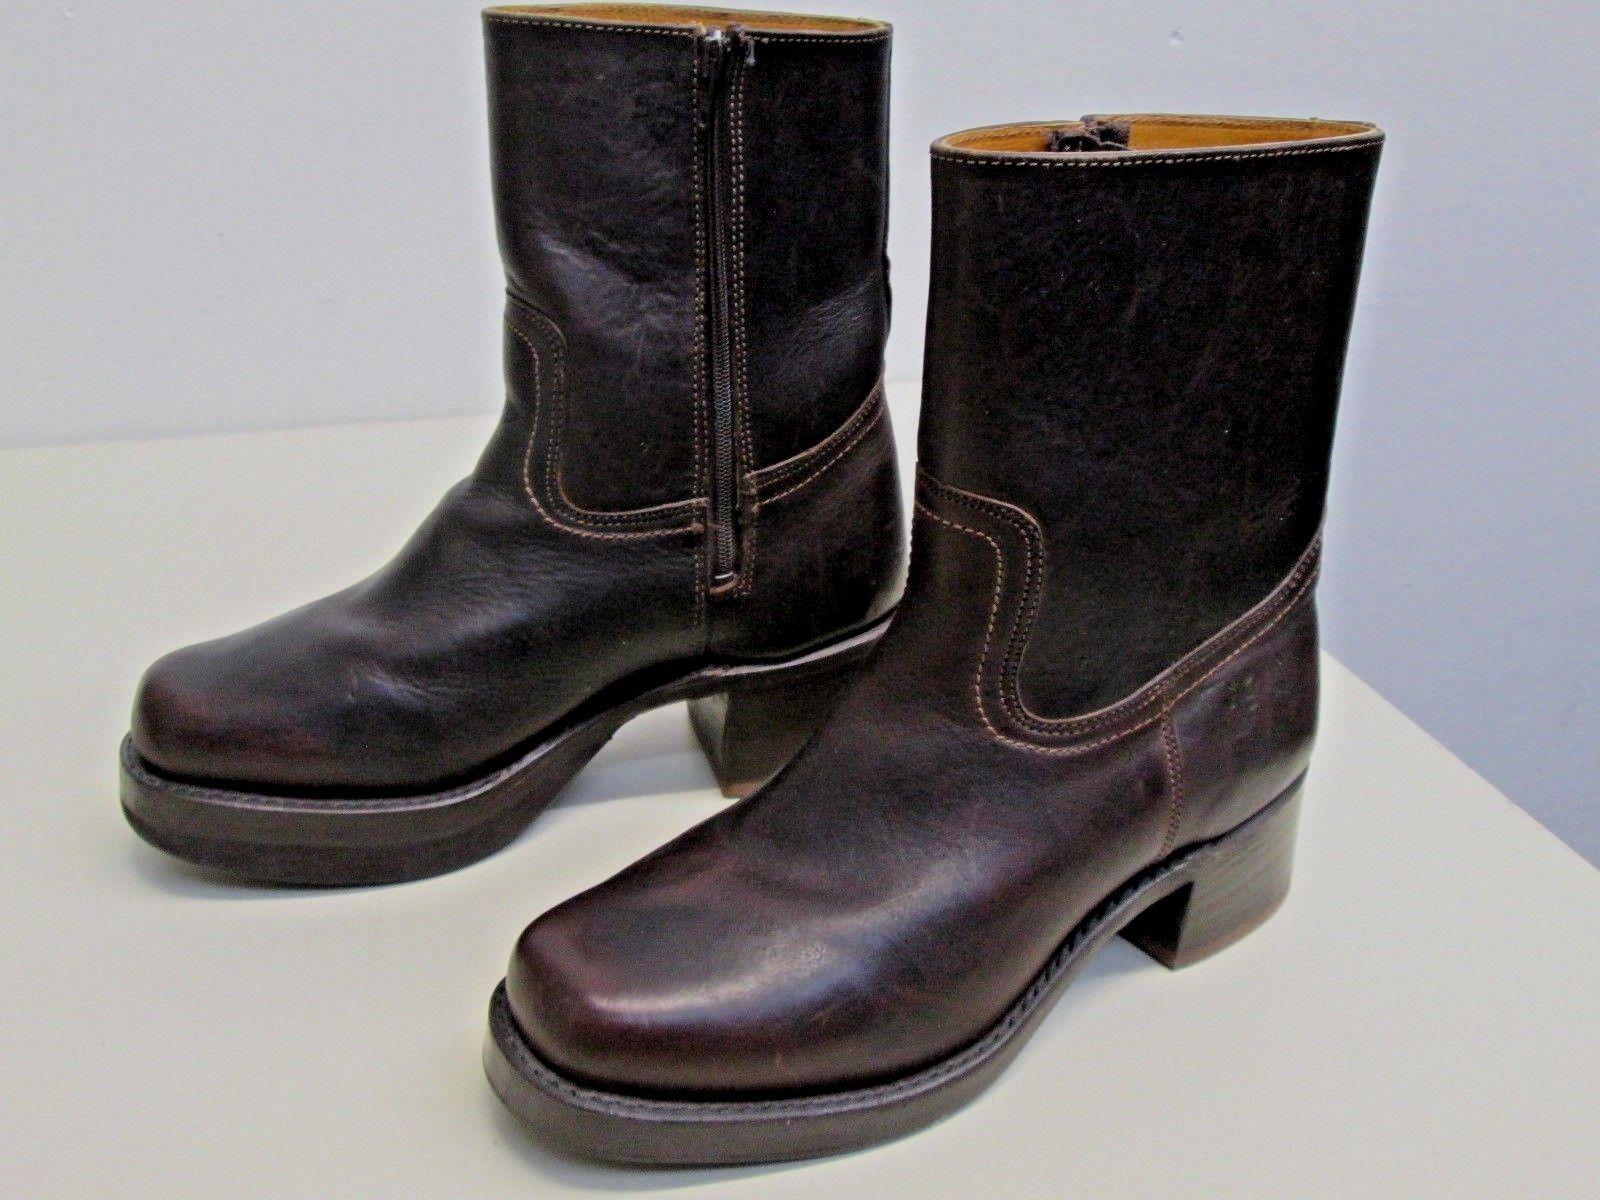 NWOB Frye Boots Short Campus side Zip size 7.5M 77235 Blazer Brown Excellent